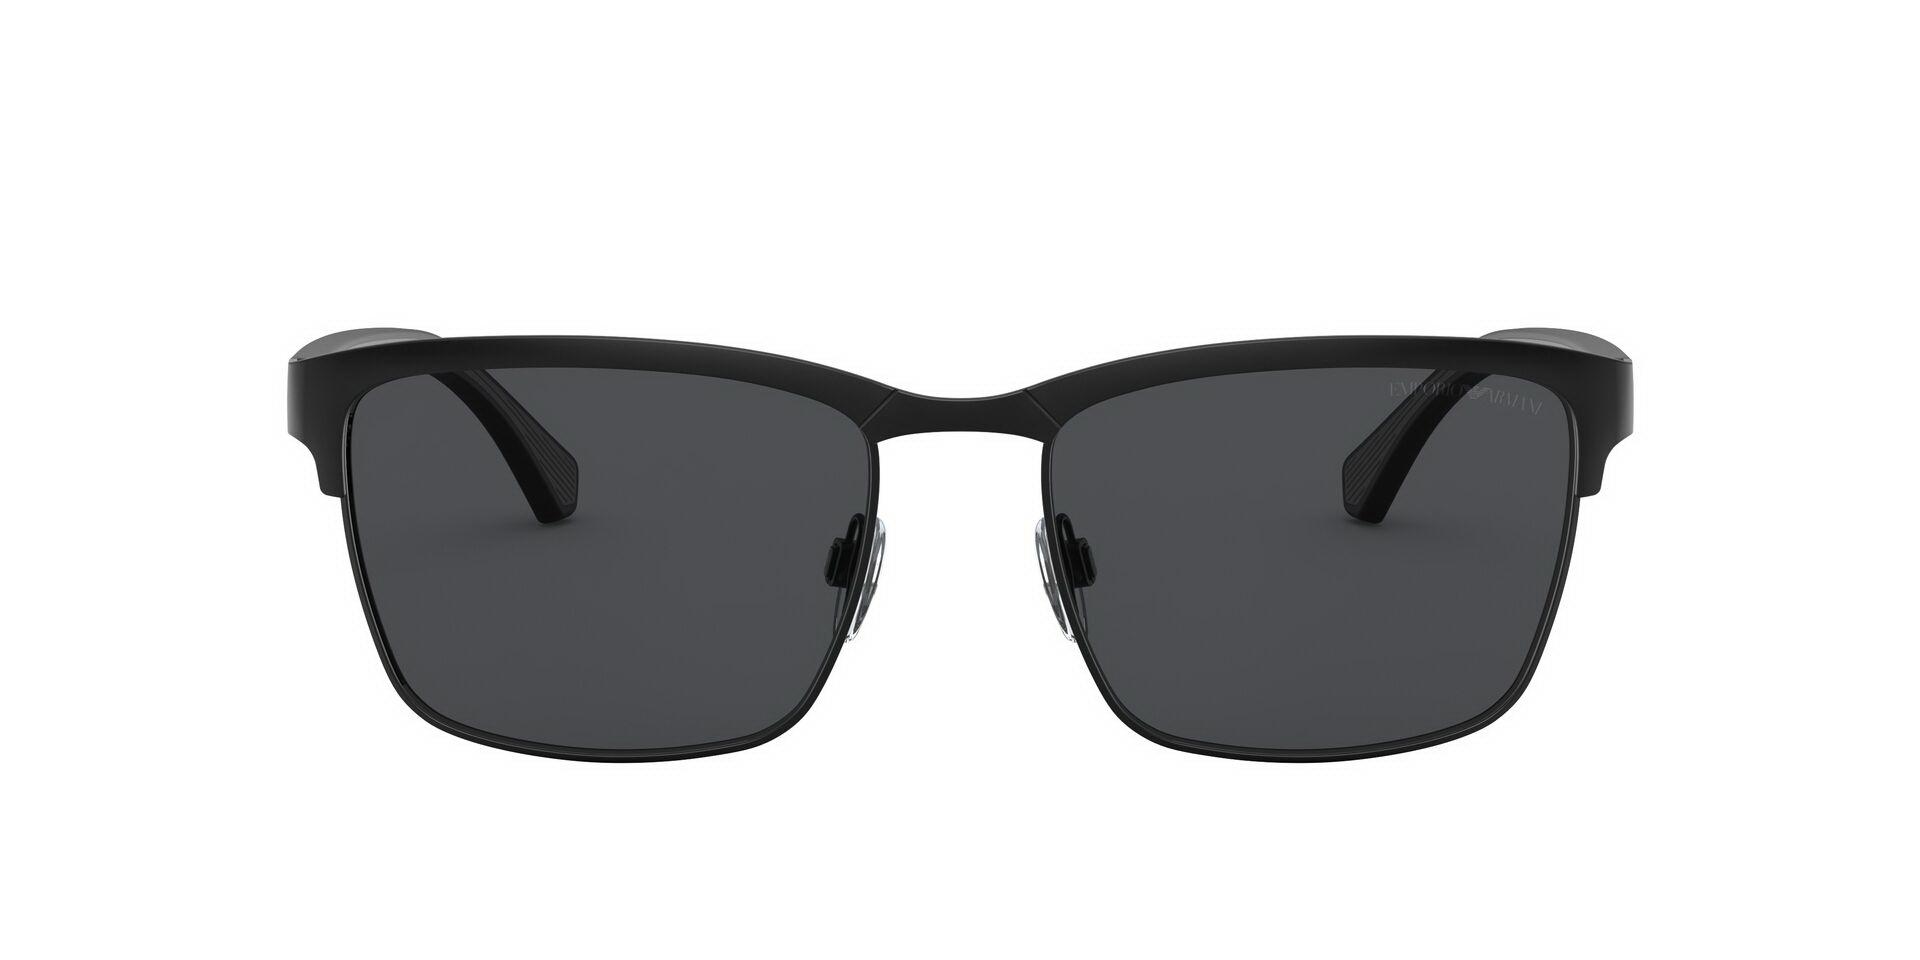 Солнцезащитные очки Очки с/з Emporio Armani 0EA2087 301487 фото